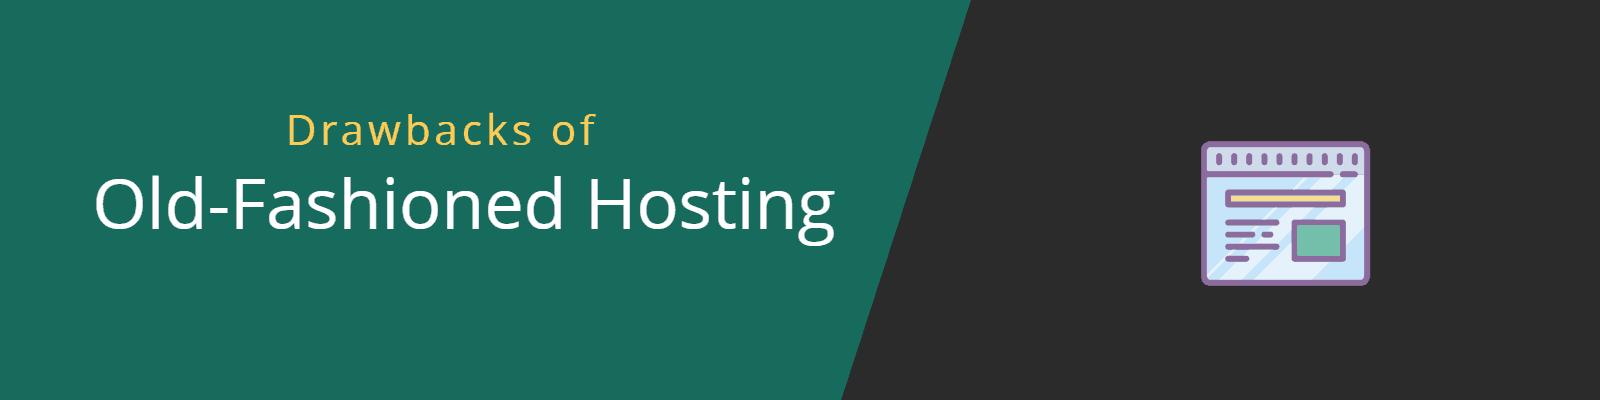 drawbacks of old fashioned hosting